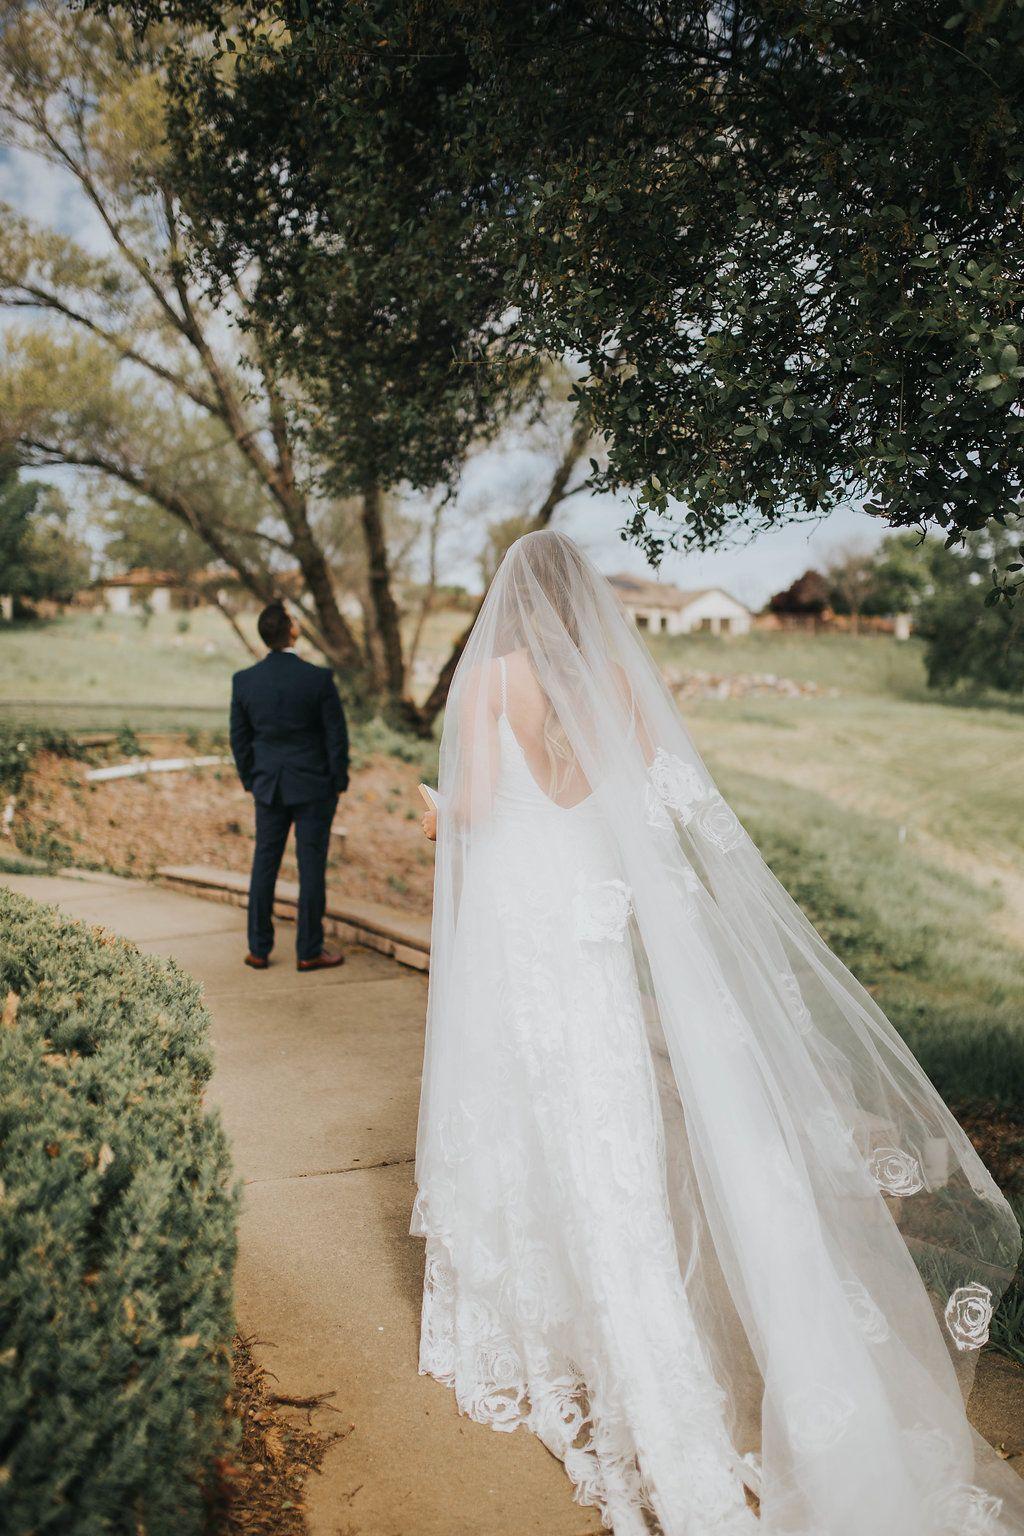 Fleur wedding dress  Oksana in the Rosa Gown u Fleur Veil  Wedding Vibes  Pinterest